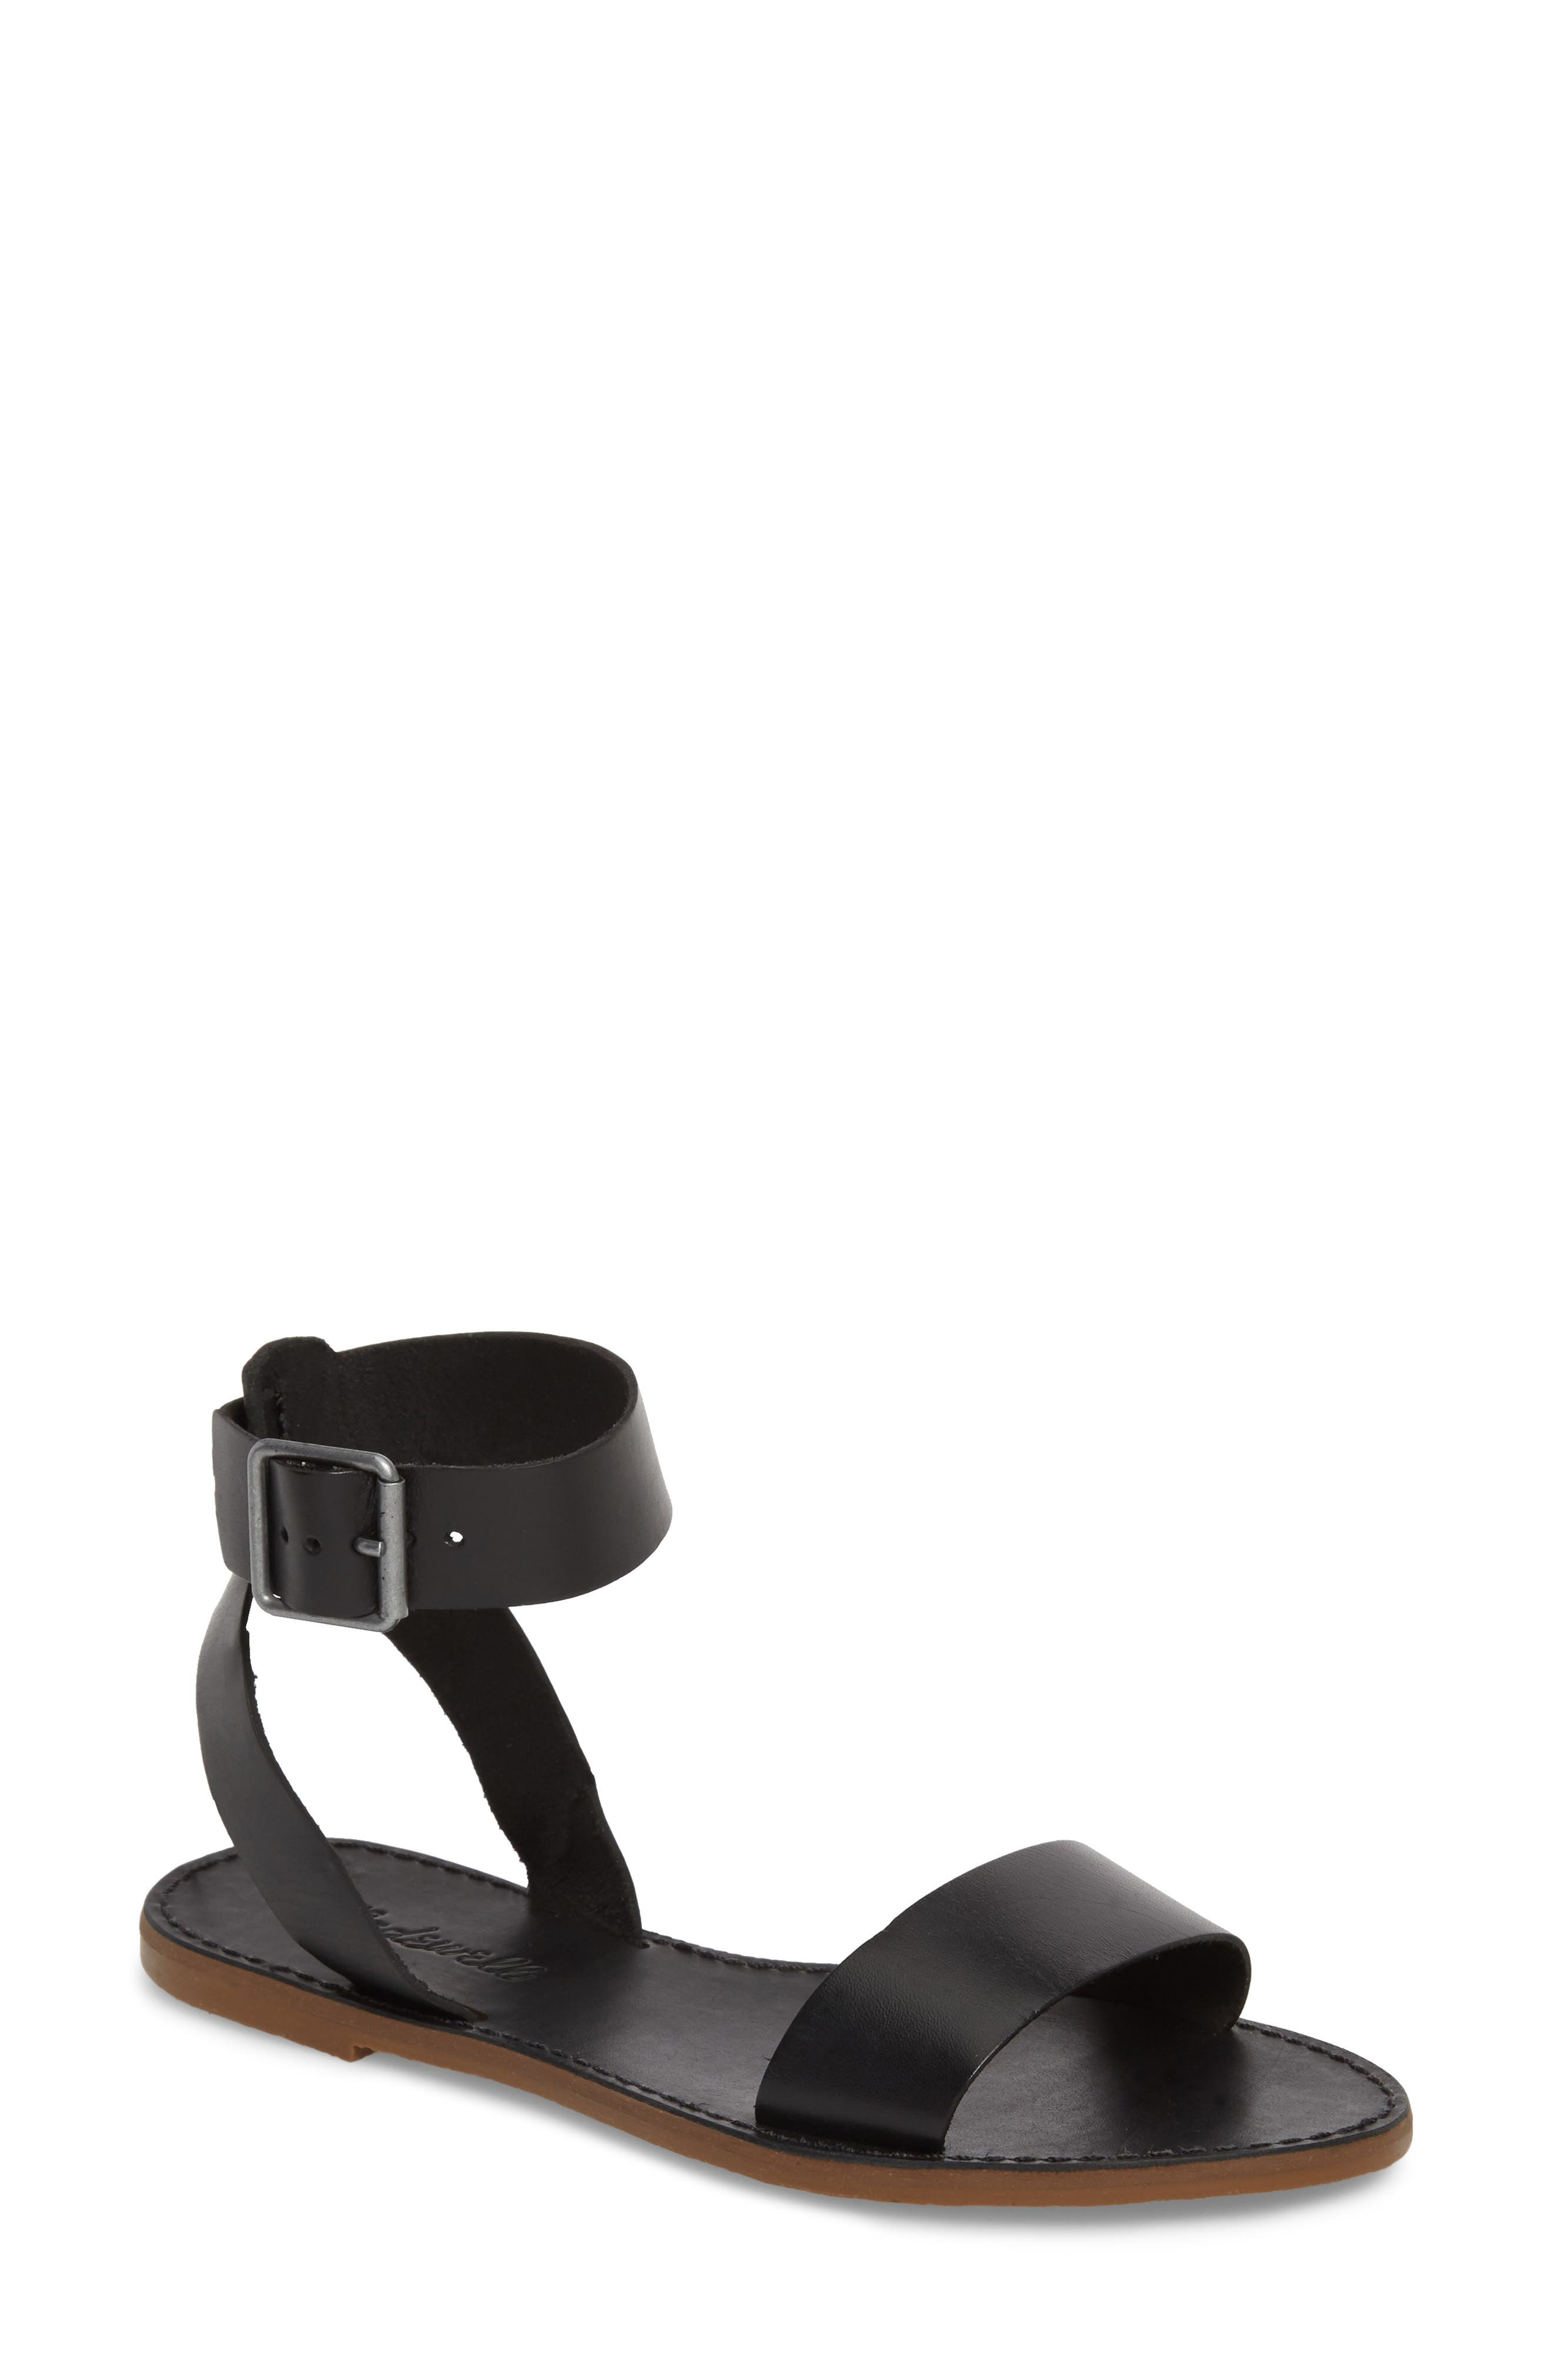 Madewell The Boardwalk Ankle Strap Sandal (Women)